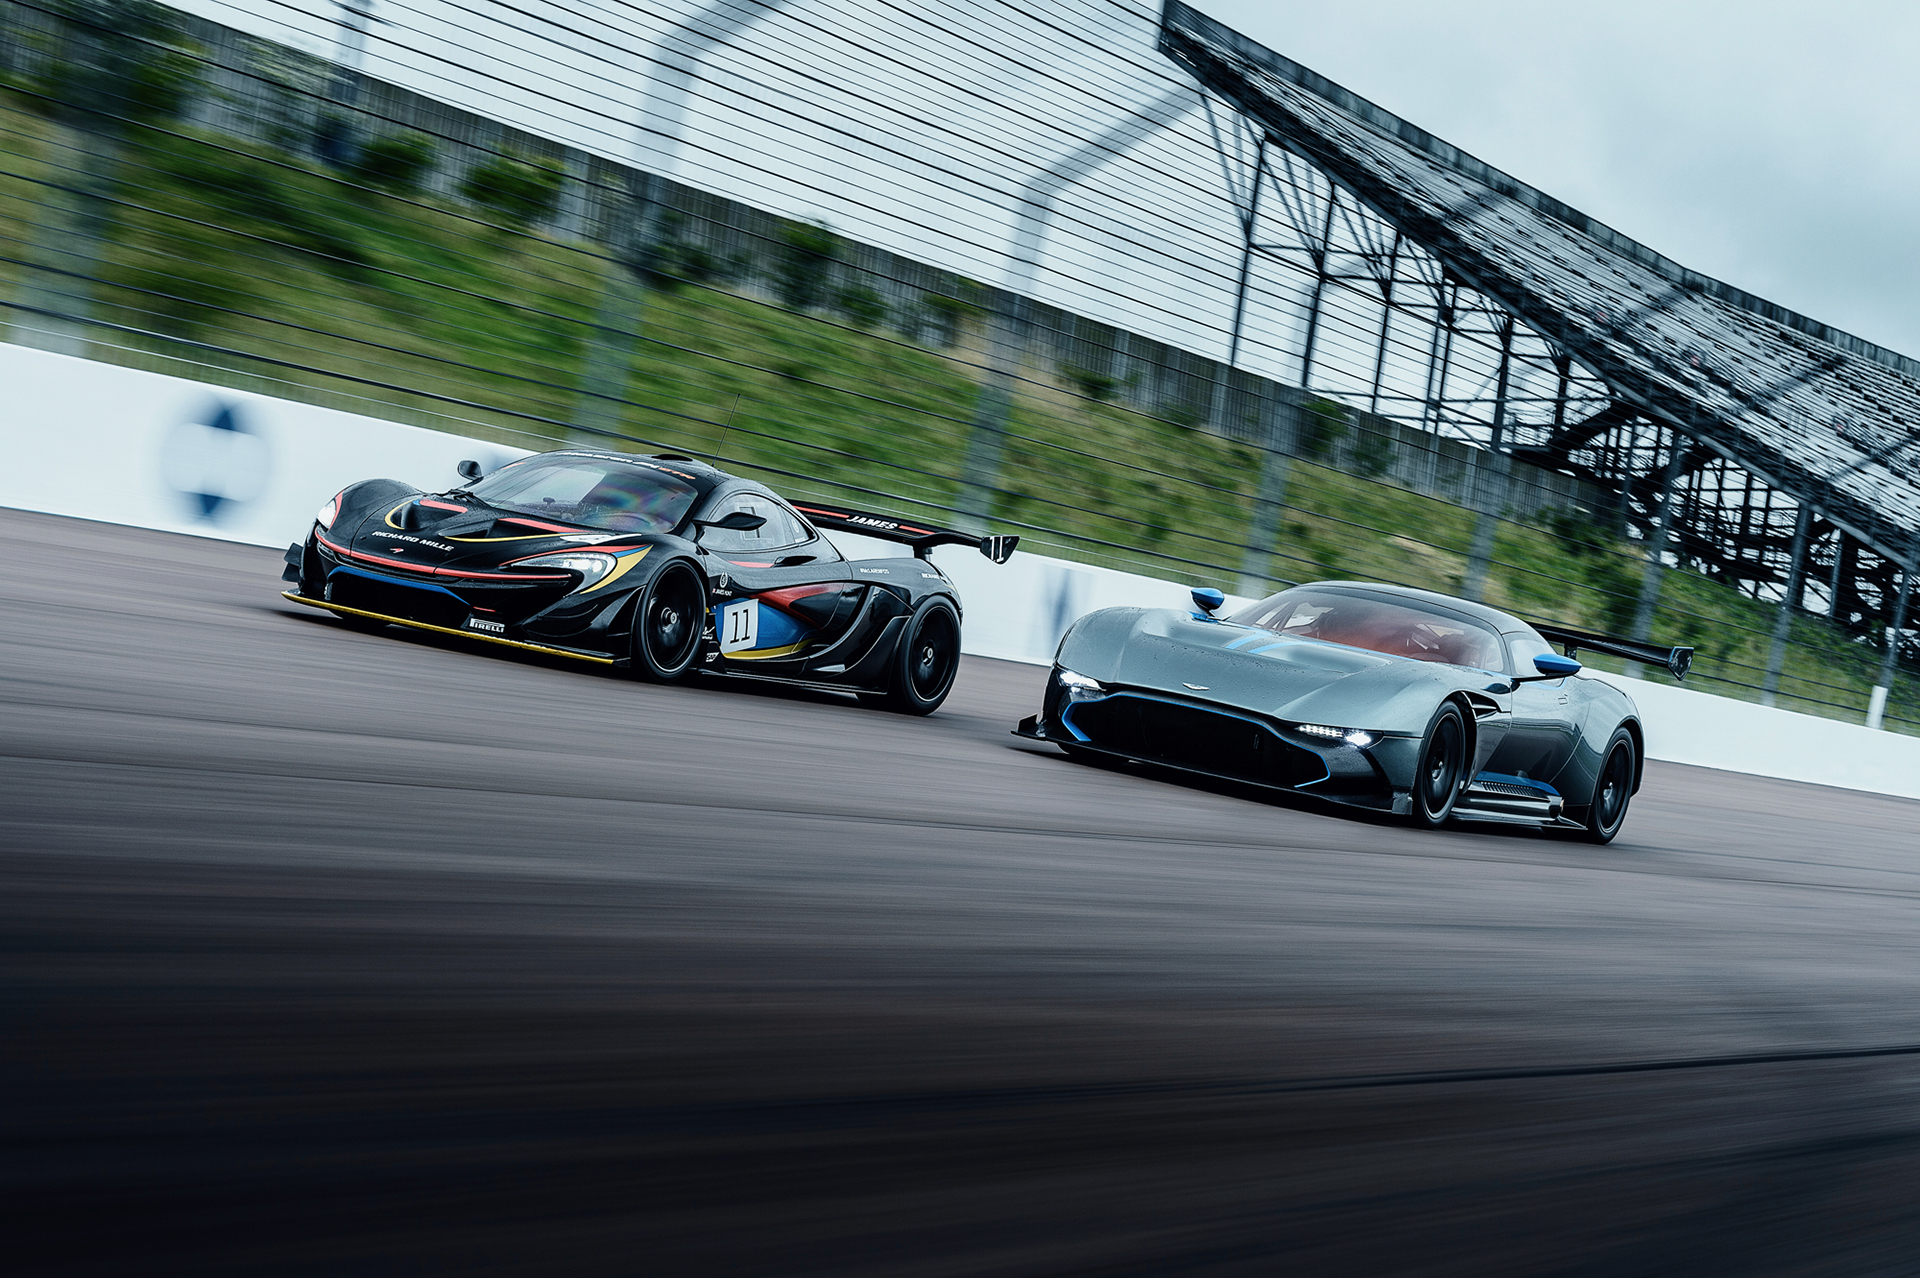 Mclaren P1 Gtr Vs Aston Martin Vulcan On Behance